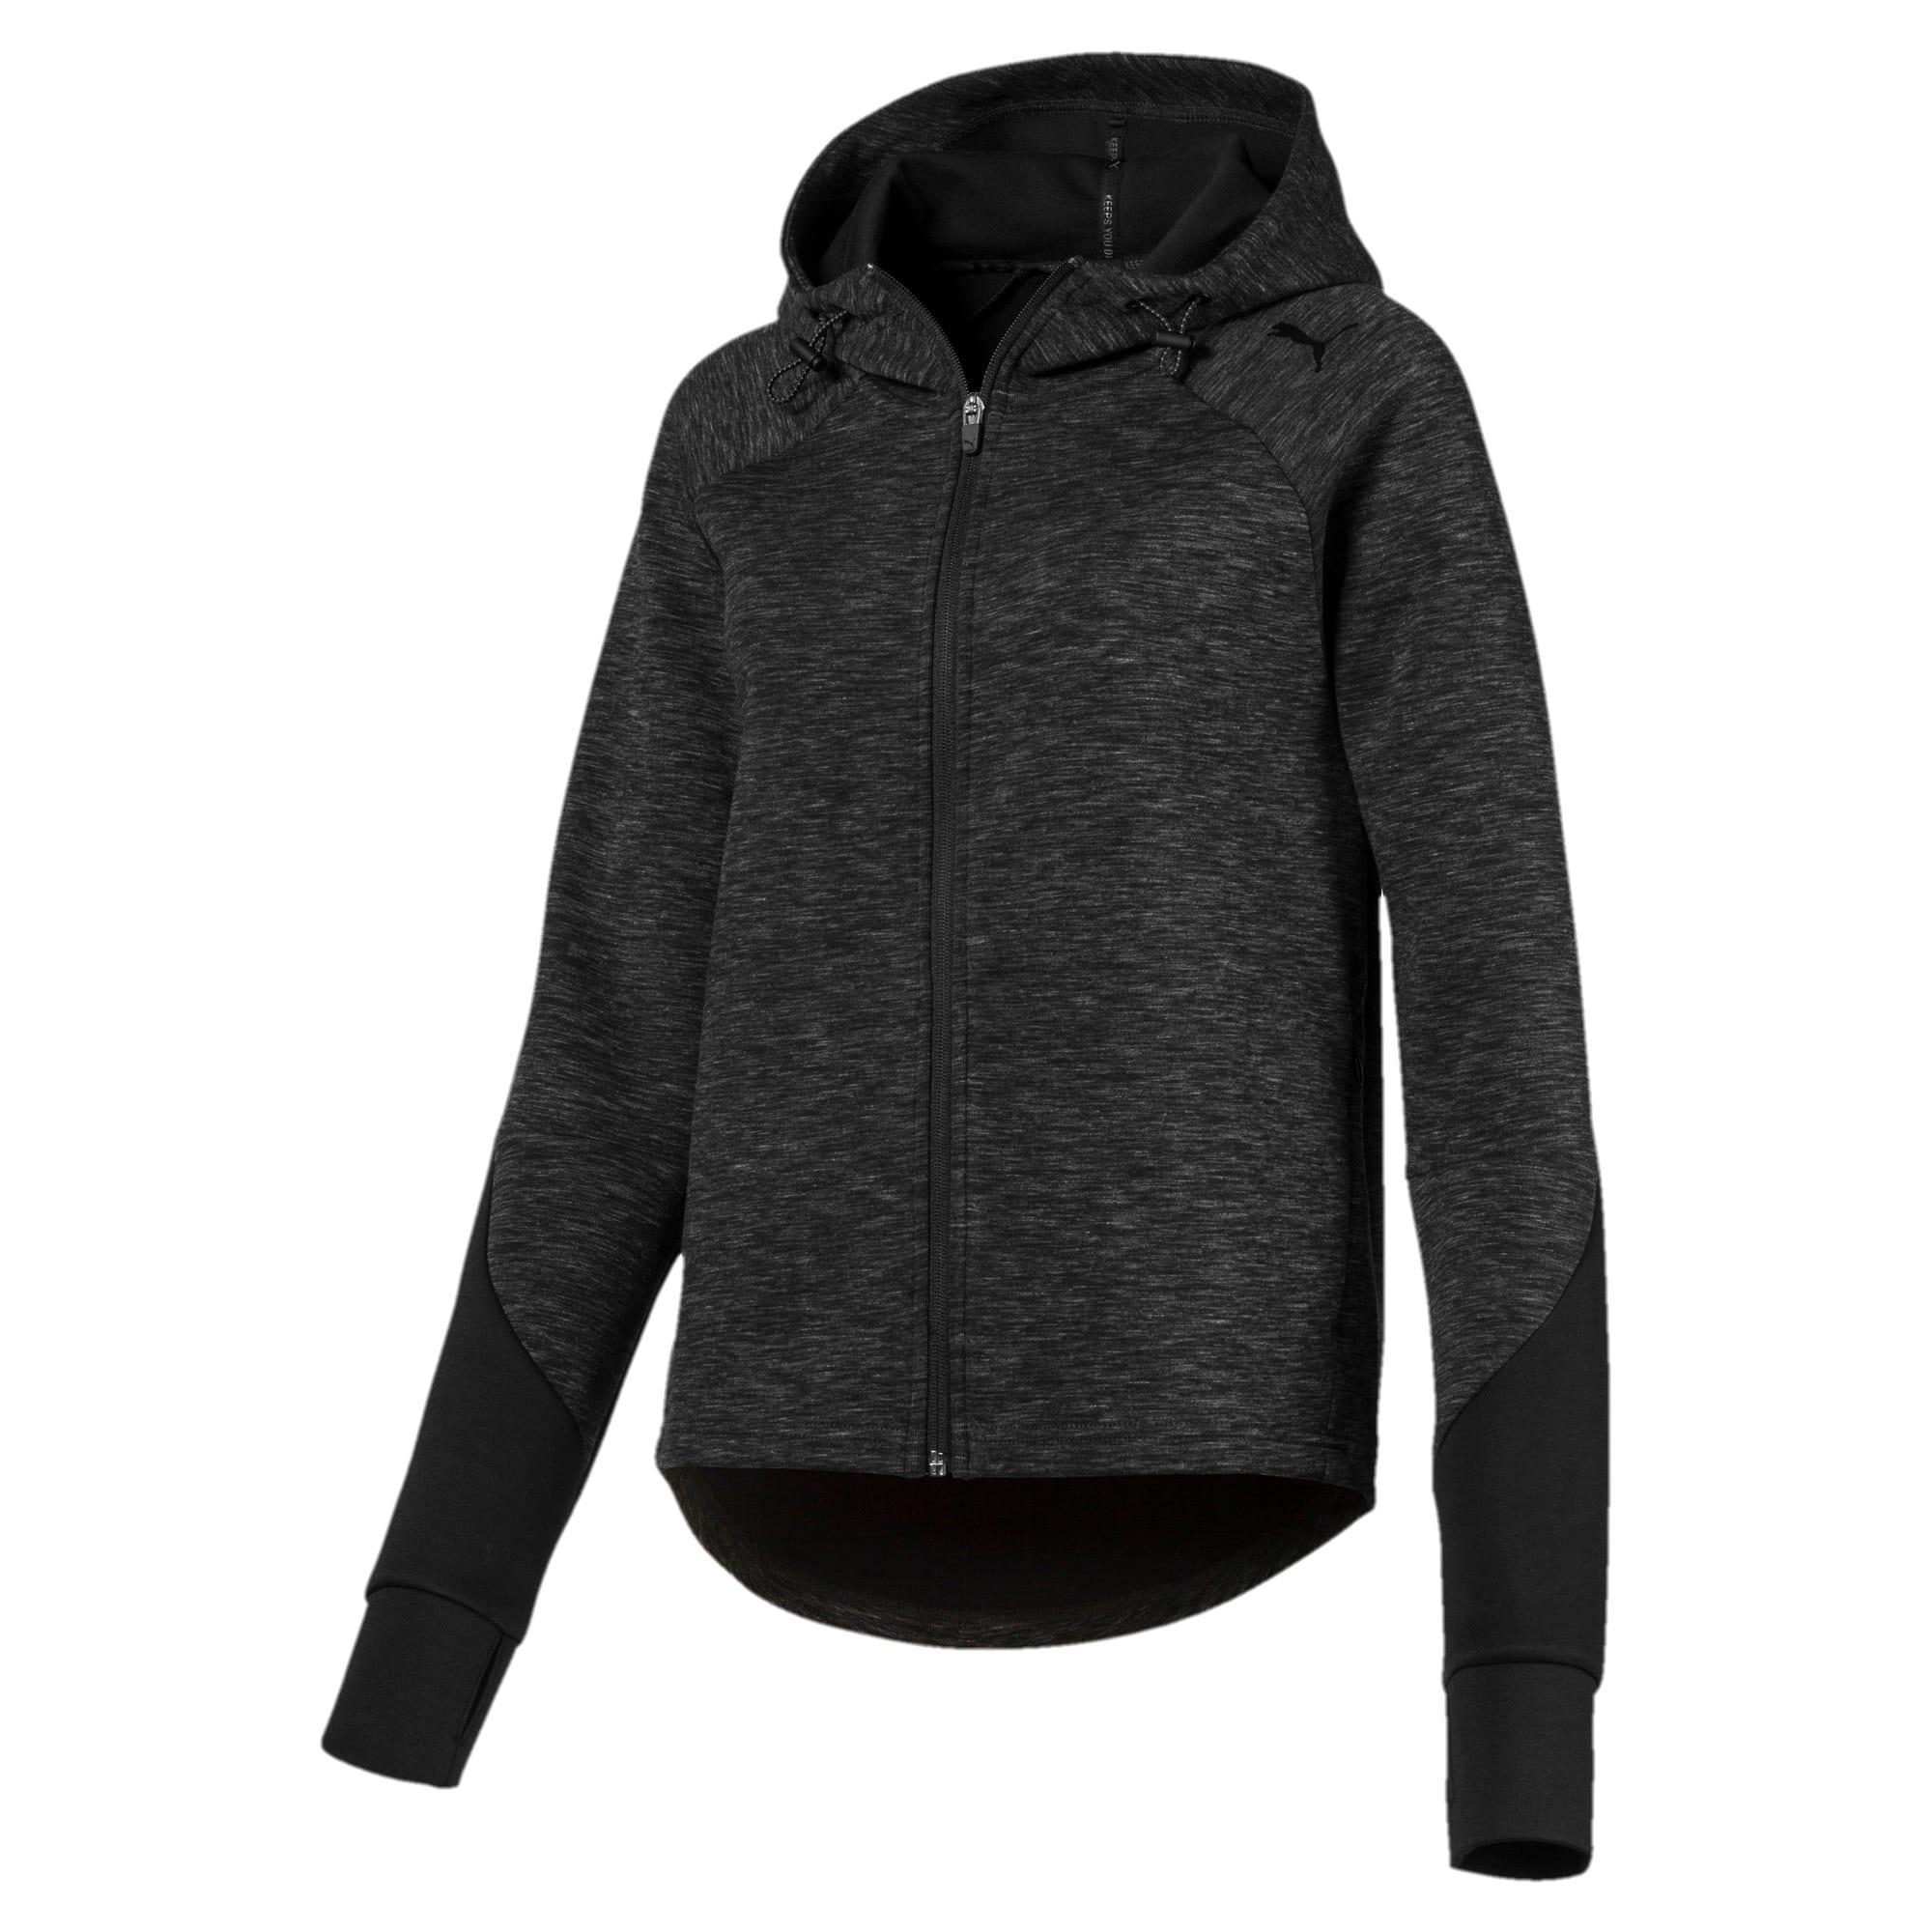 Thumbnail 1 of Evostripe hoodie met rits voor dames, Cotton Black-heather, medium